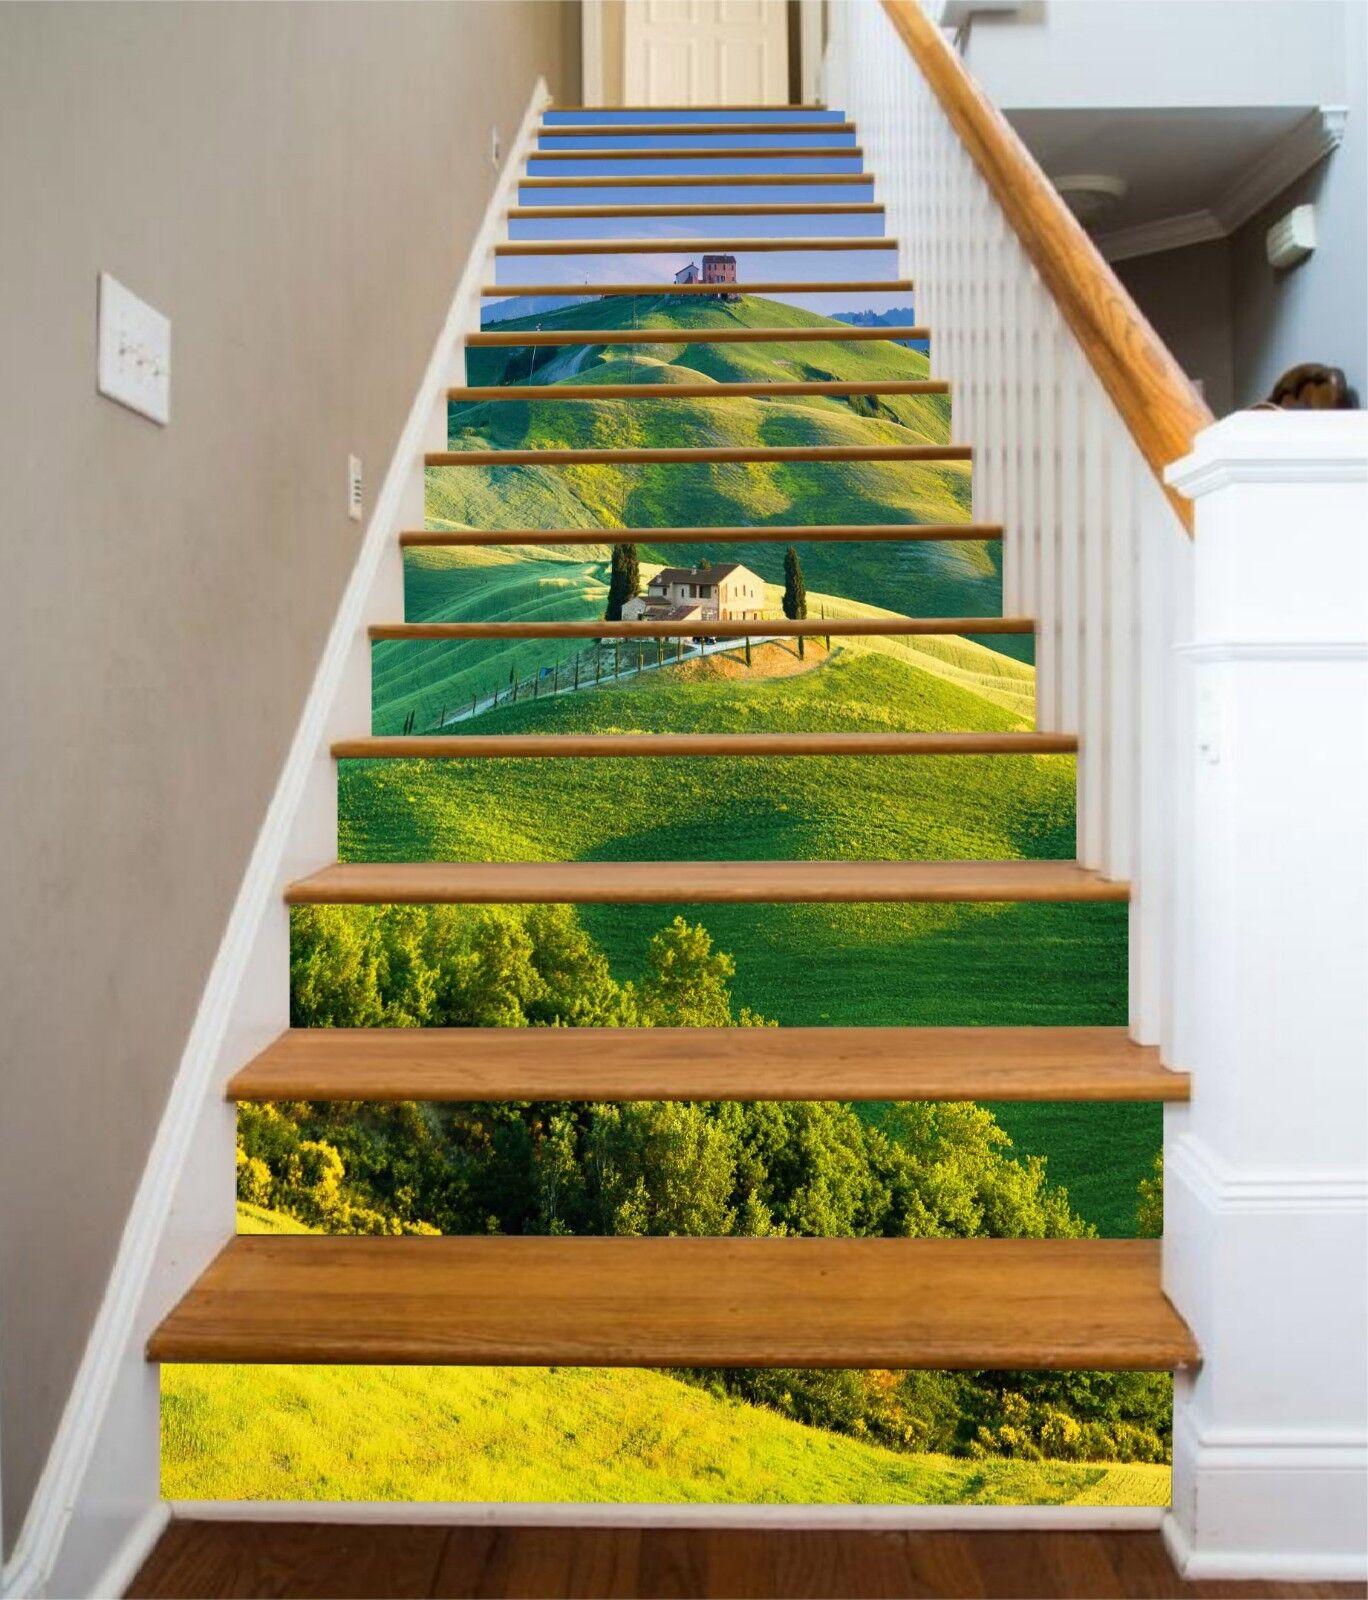 3D Grne Berge 2180 Stair Risers Dekoration Fototapete Vinyl Aufkleber Tapete DE